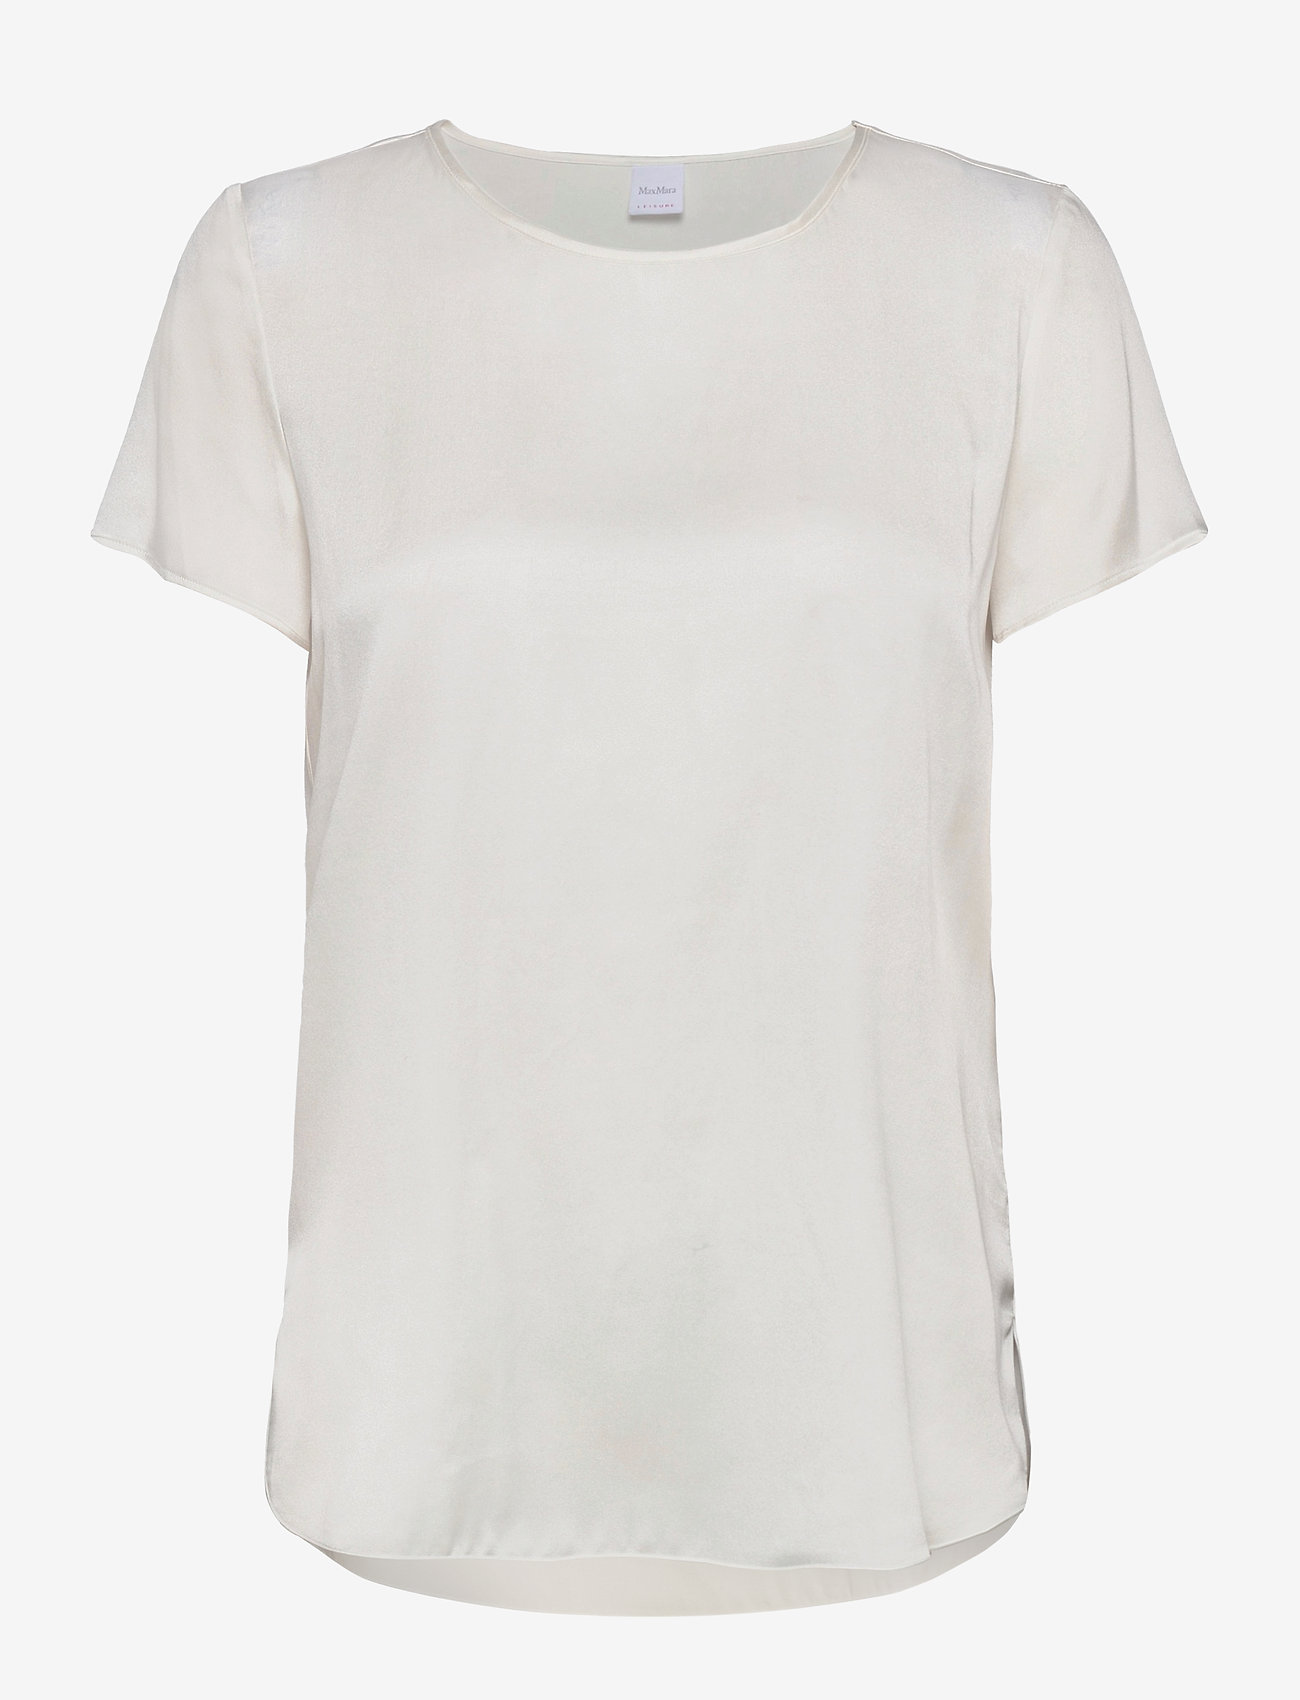 Max Mara Leisure - CORTONA - short-sleeved blouses - white - 0